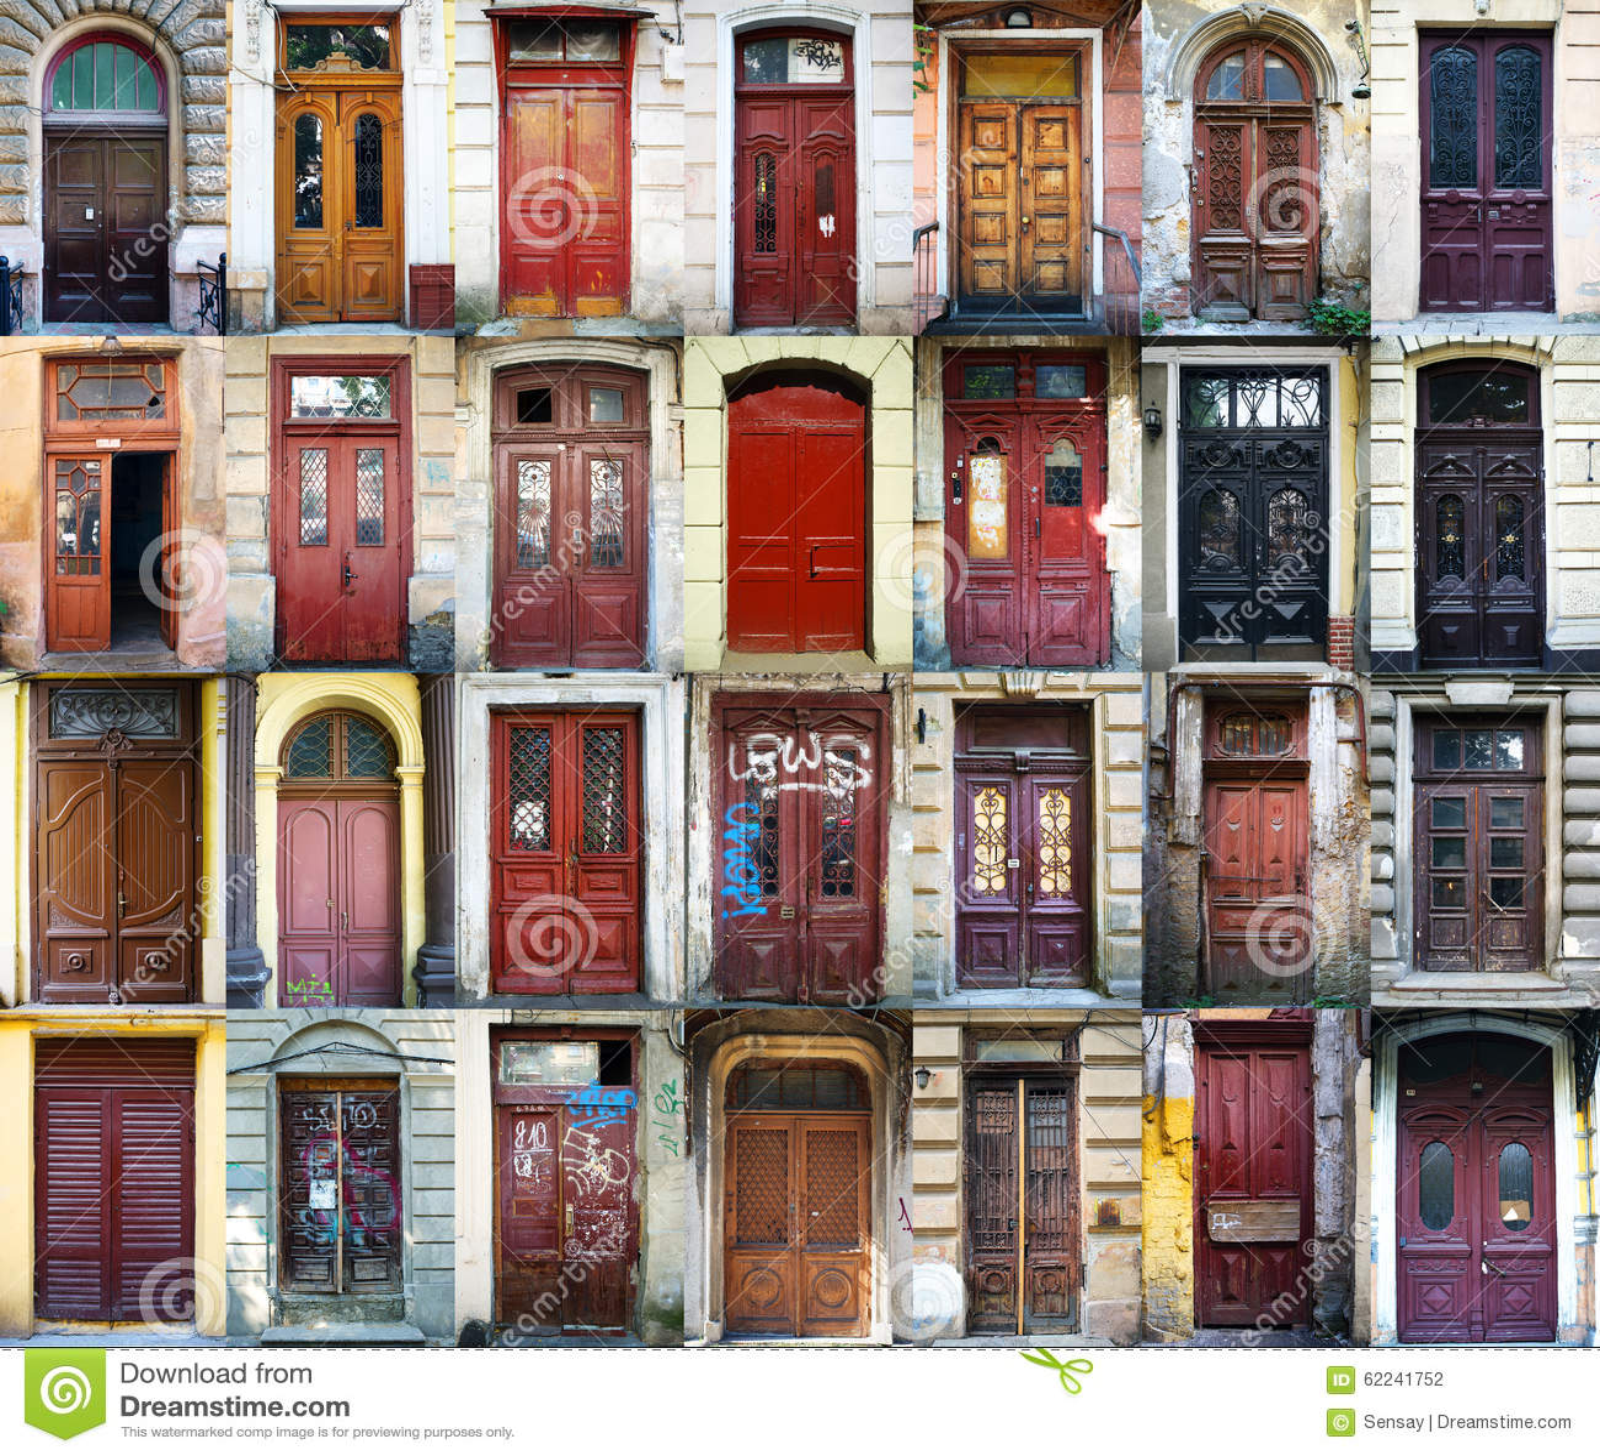 A Colage Of 28 Vintage Doors In Odessa Ukraine Stock